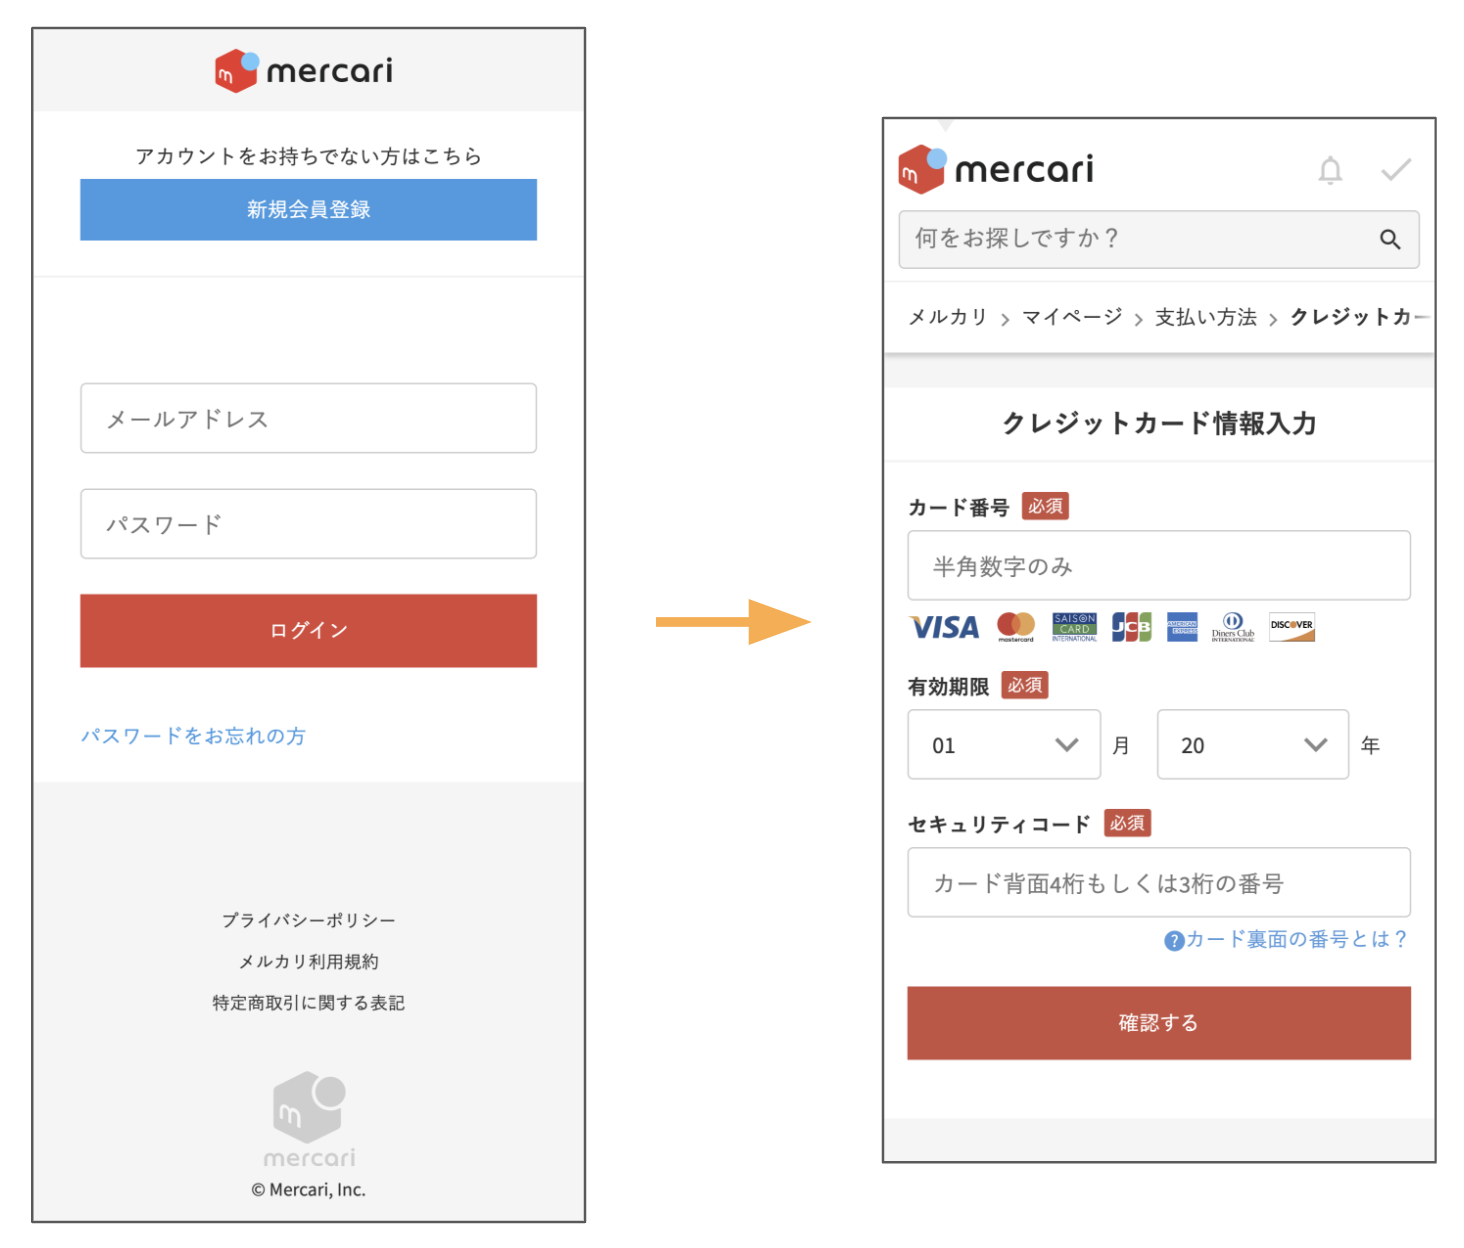 Screenshots of a phishing site imitating Mercari (past example)